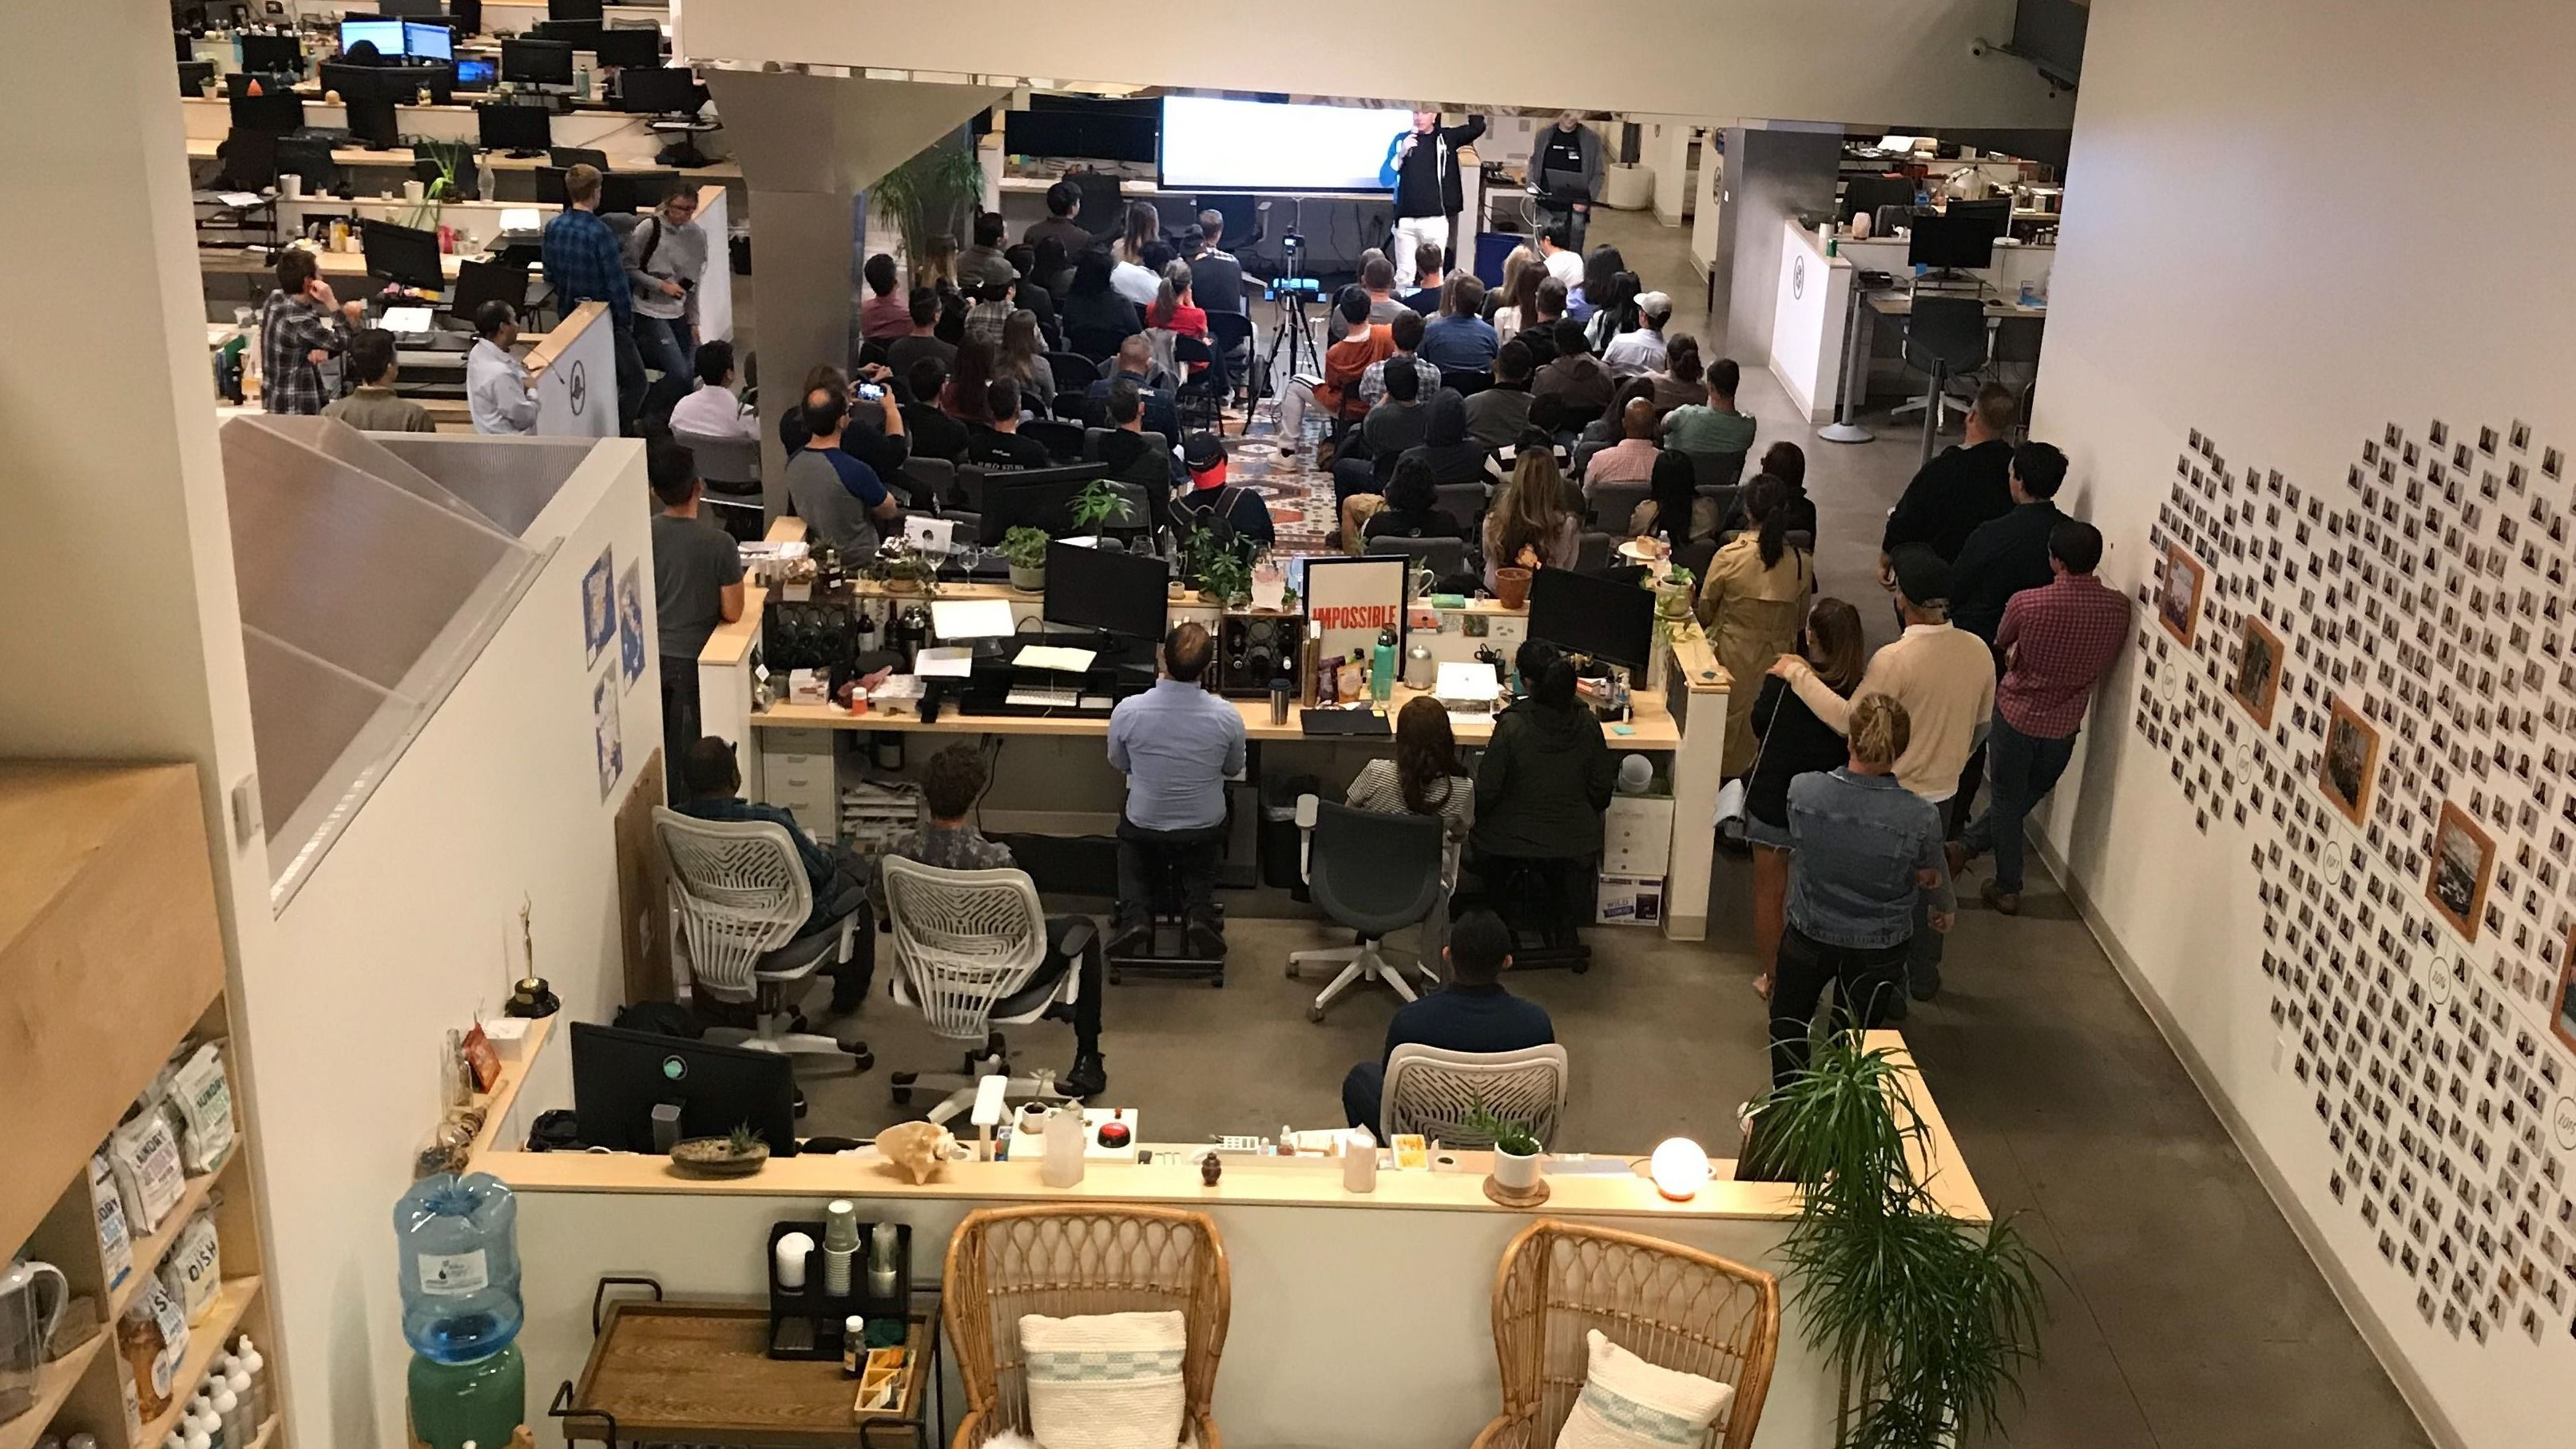 Miami Software QA/DEV Meetup